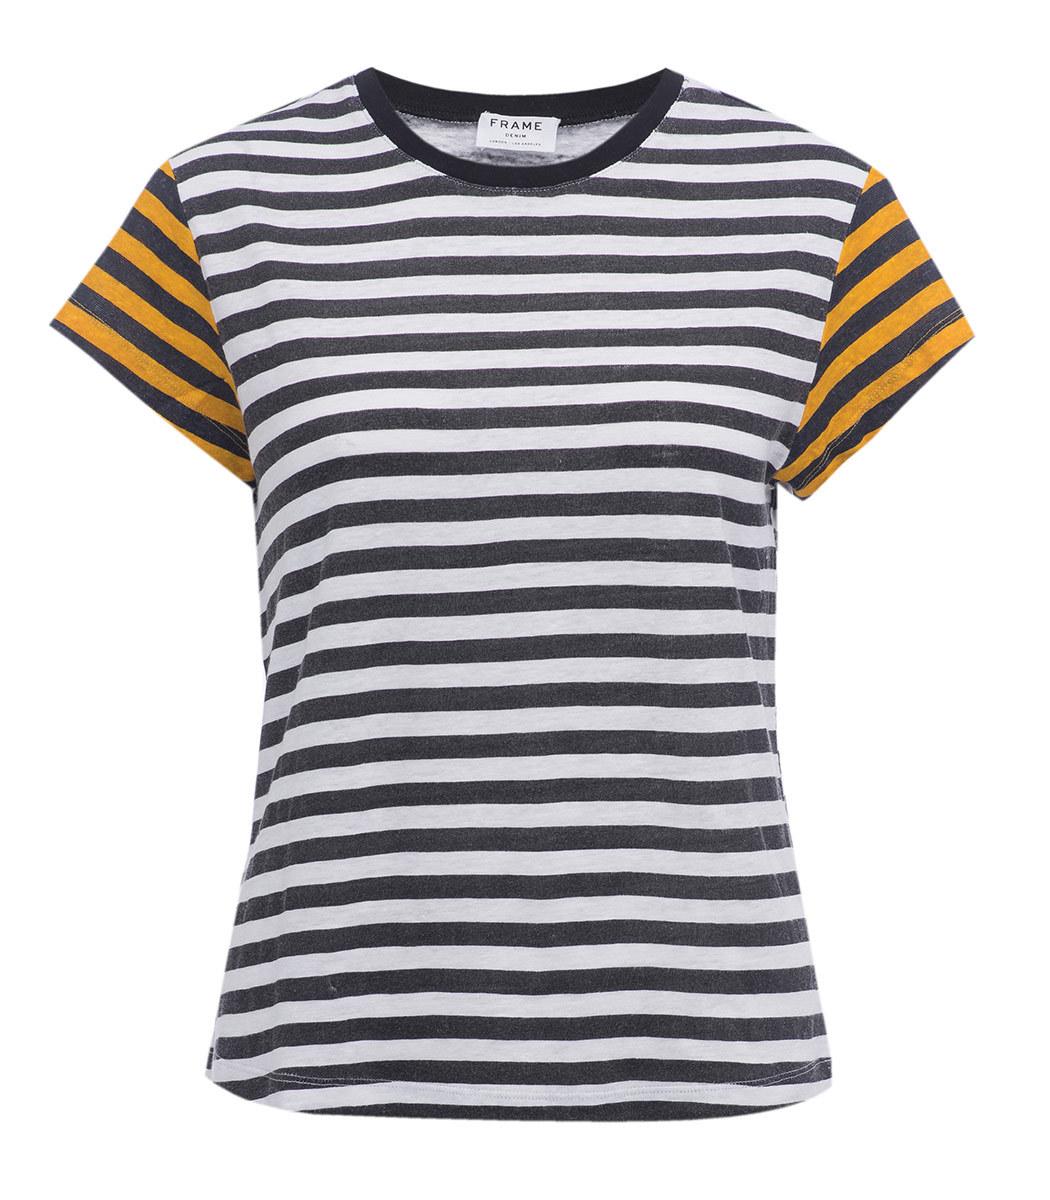 Frame Black, White & Yellow Stripe T-Shirt - Black, White & Yellow ...